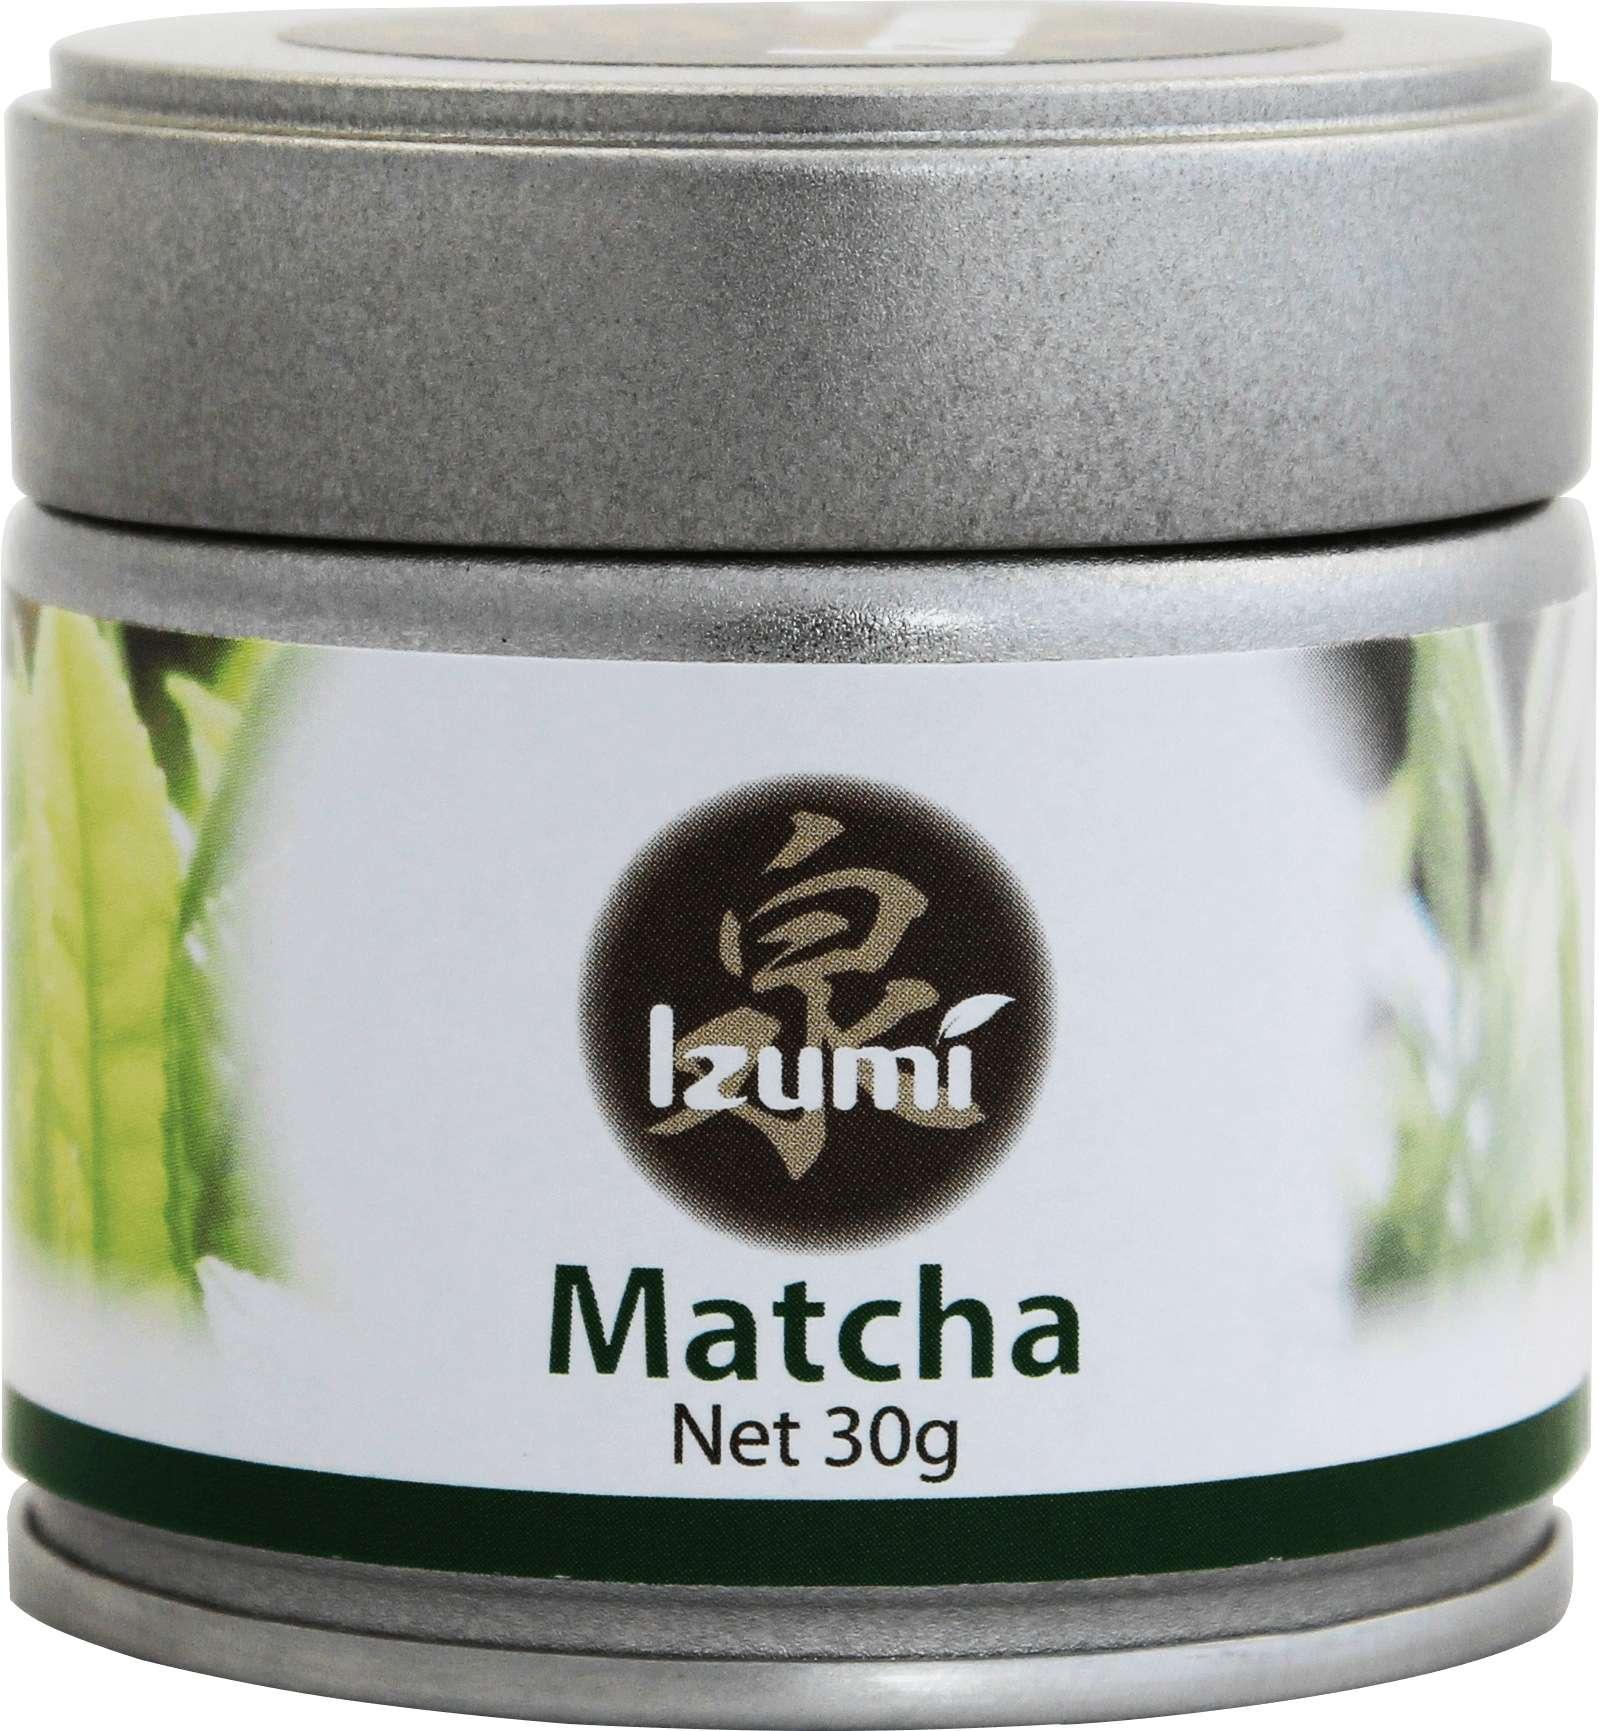 the matcha izumi